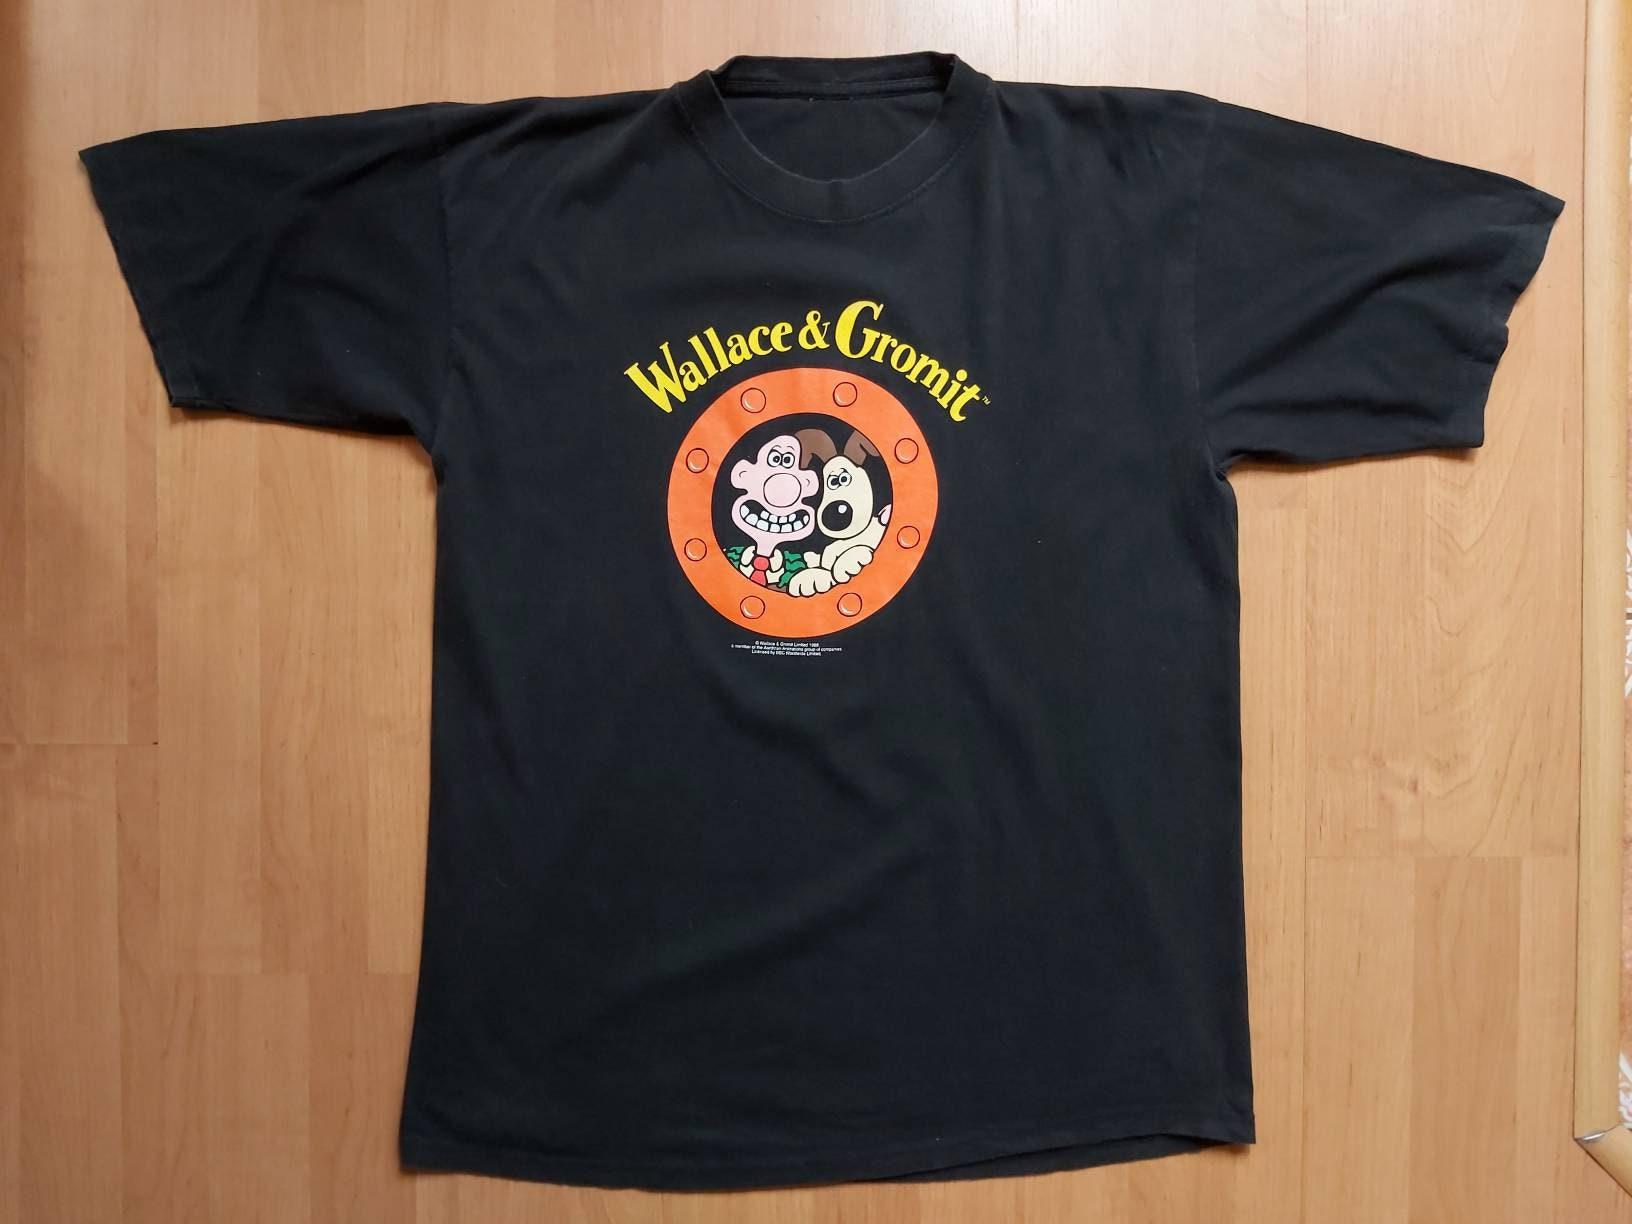 80s Tops, Shirts, T-shirts, Blouse   90s T-shirts Rare Vintage 1989 Wallace  Gromit Bbc T-Shirt Tv Series Movie Promo Shirt Black Wallce Grommit Fits Size Lxl $69.51 AT vintagedancer.com